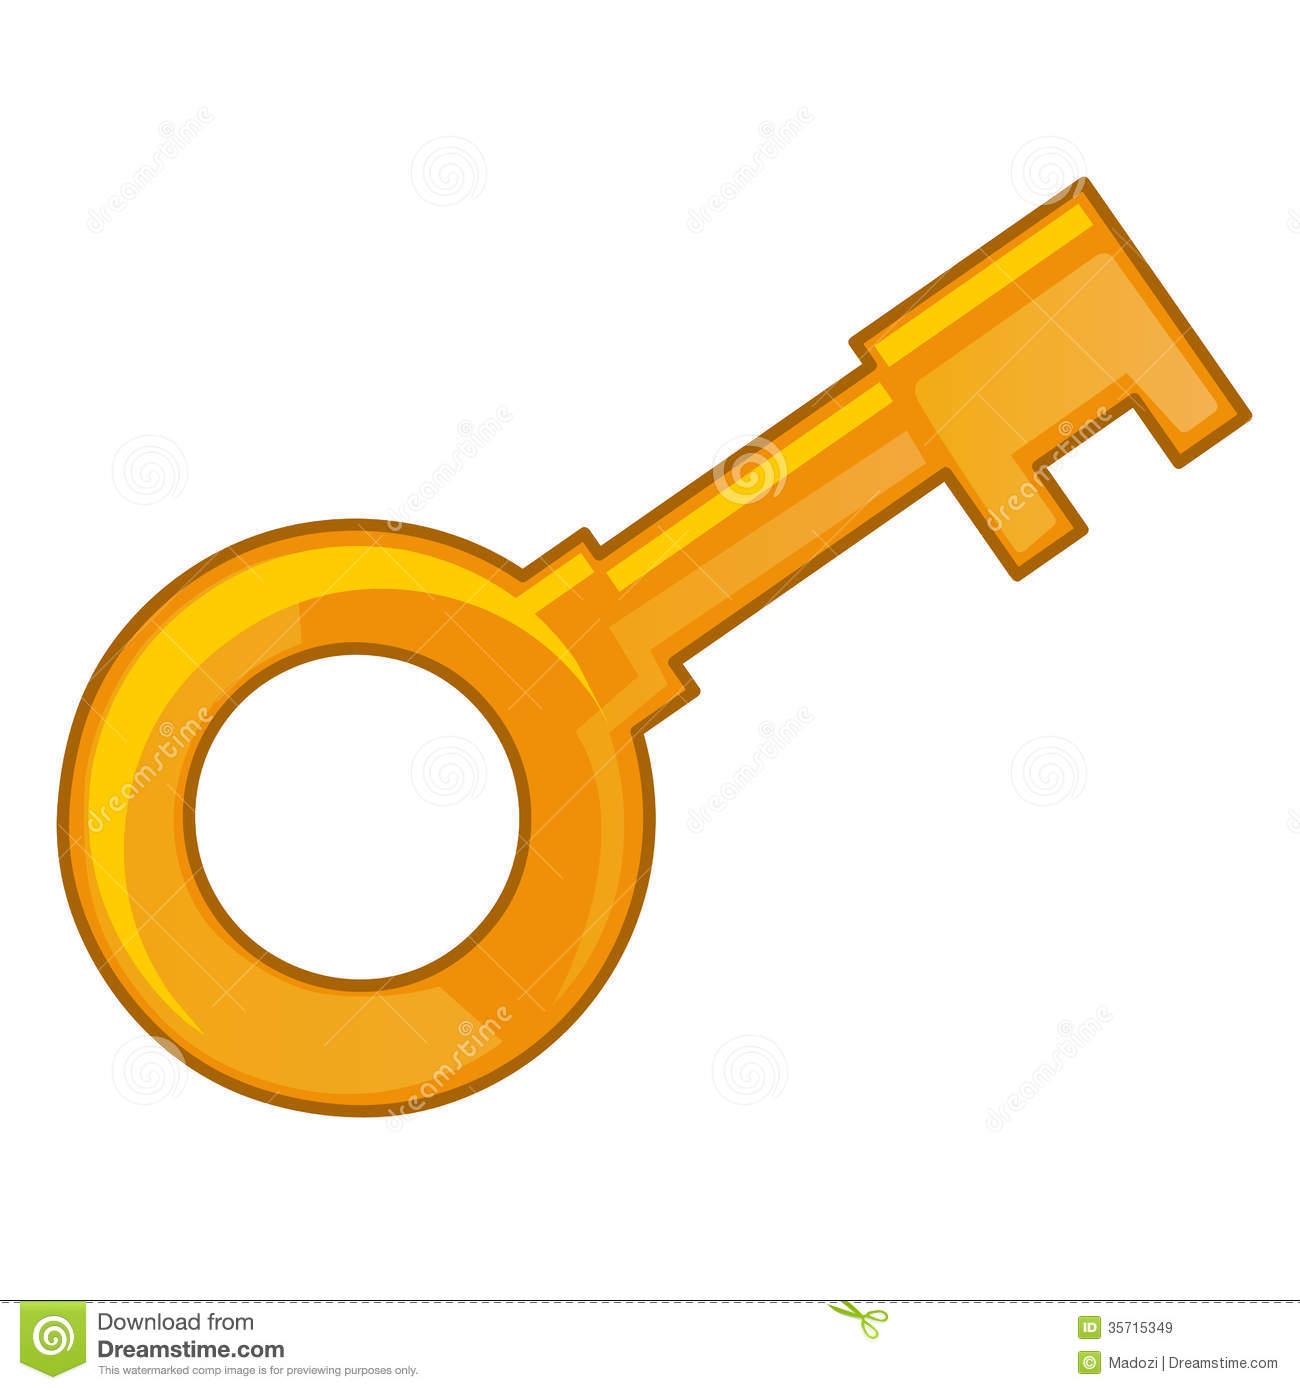 Free download best on. Keys clipart gold key